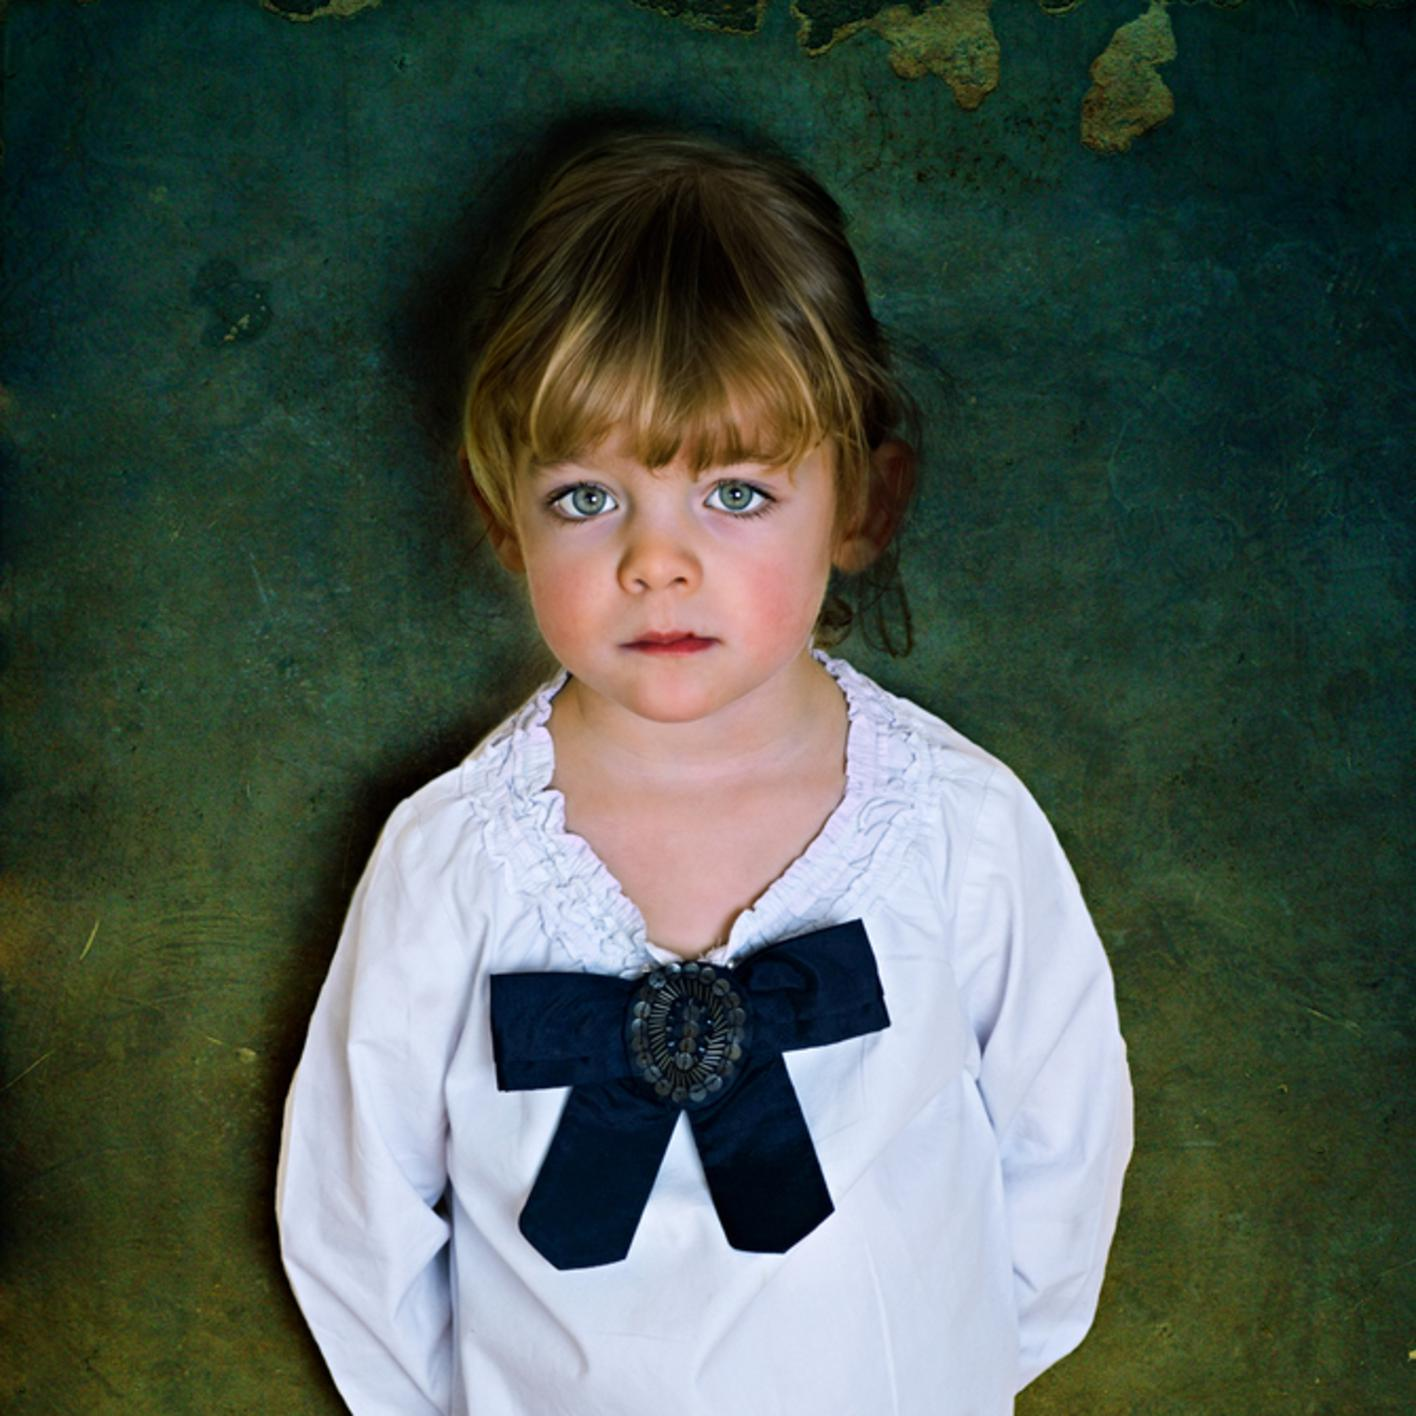 Фото детей фотографа жаклин робертс